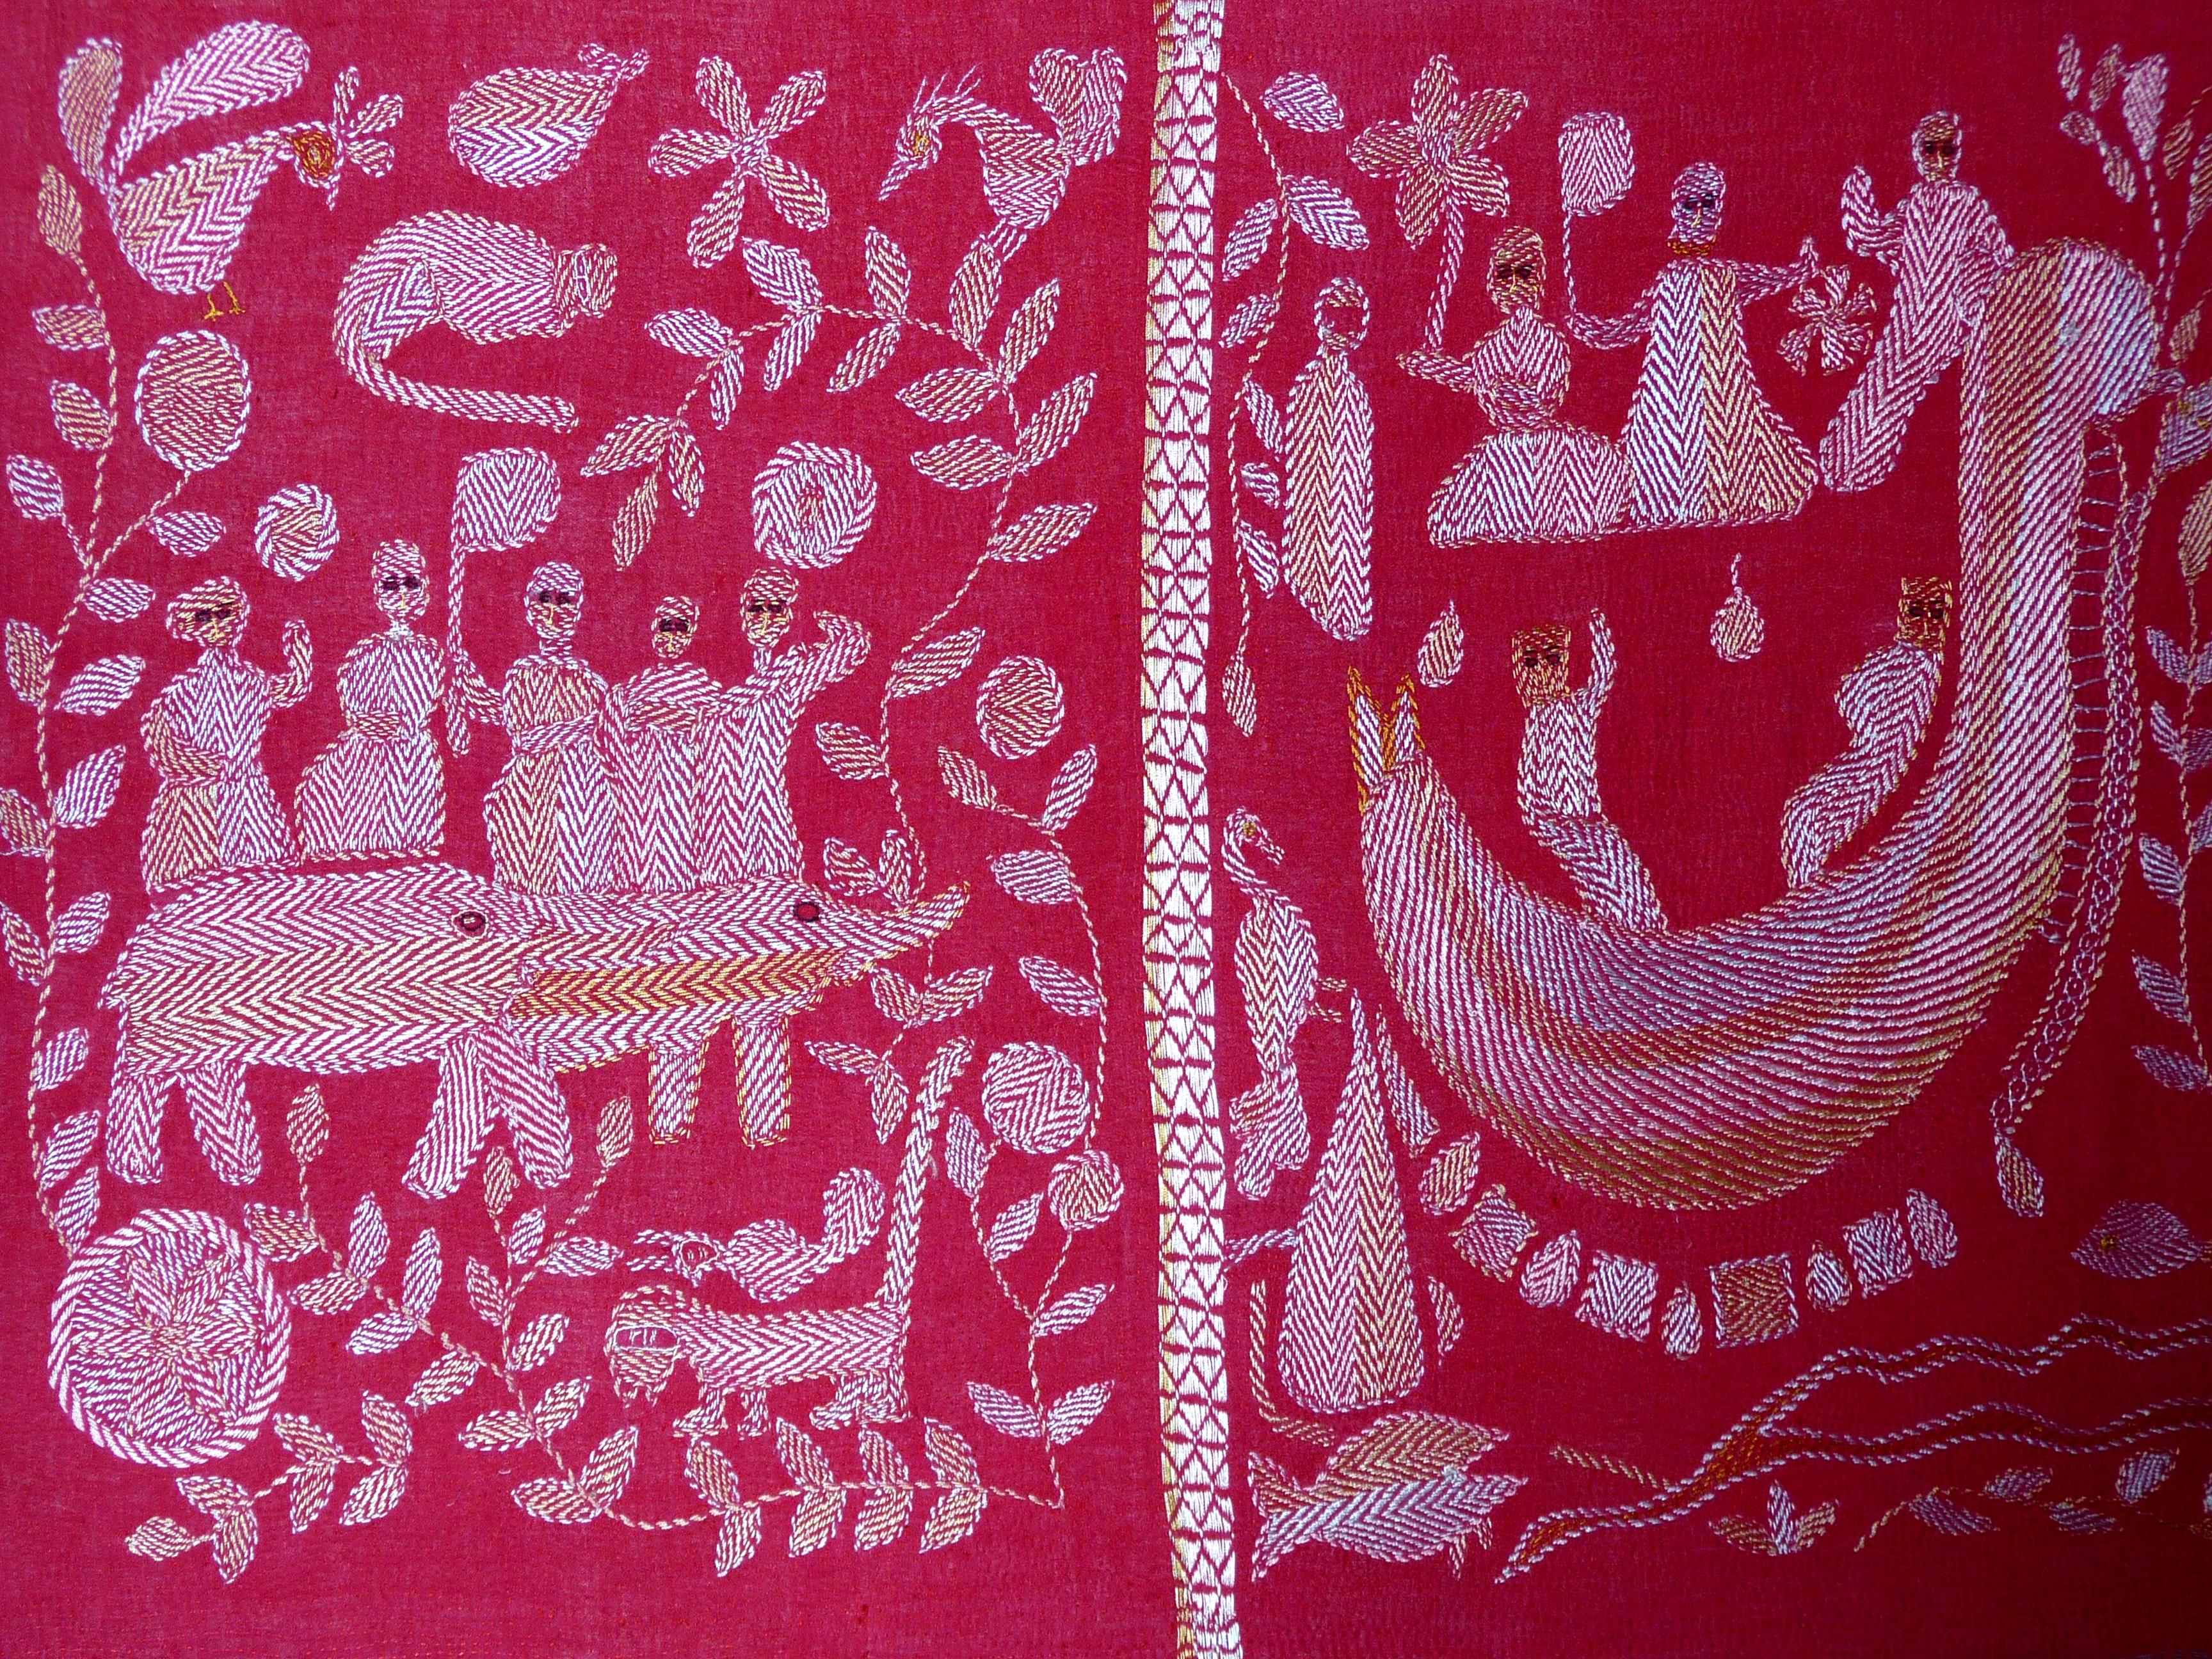 kantha embroidery made in Bangladesh